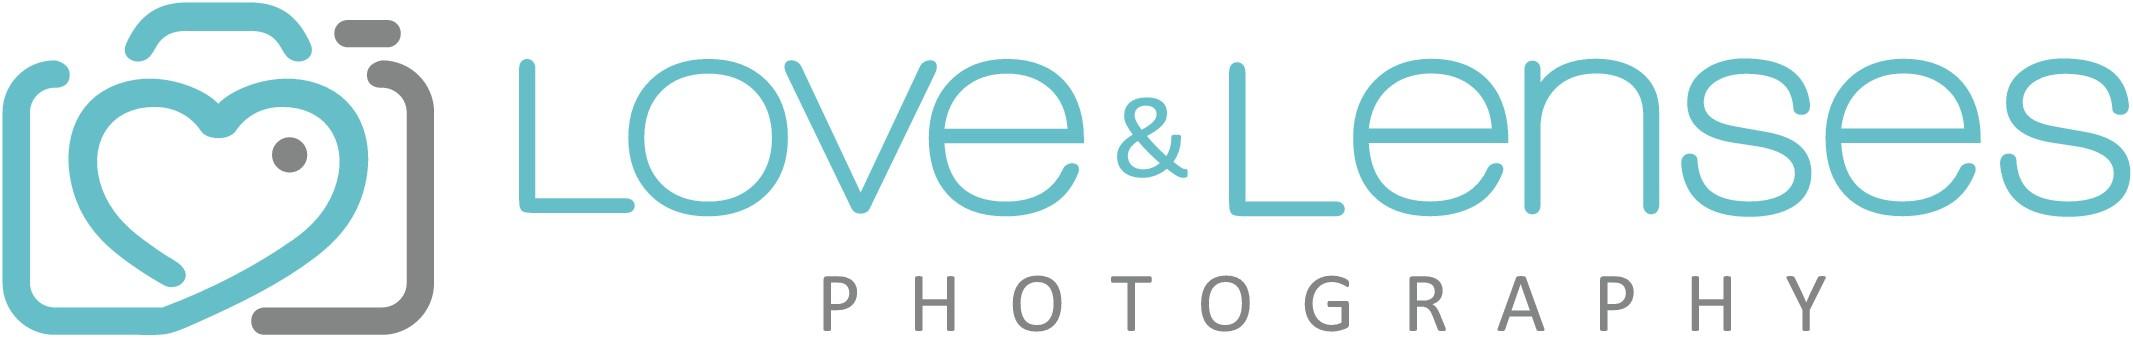 Create a unique new logo for a vibrant photography company.